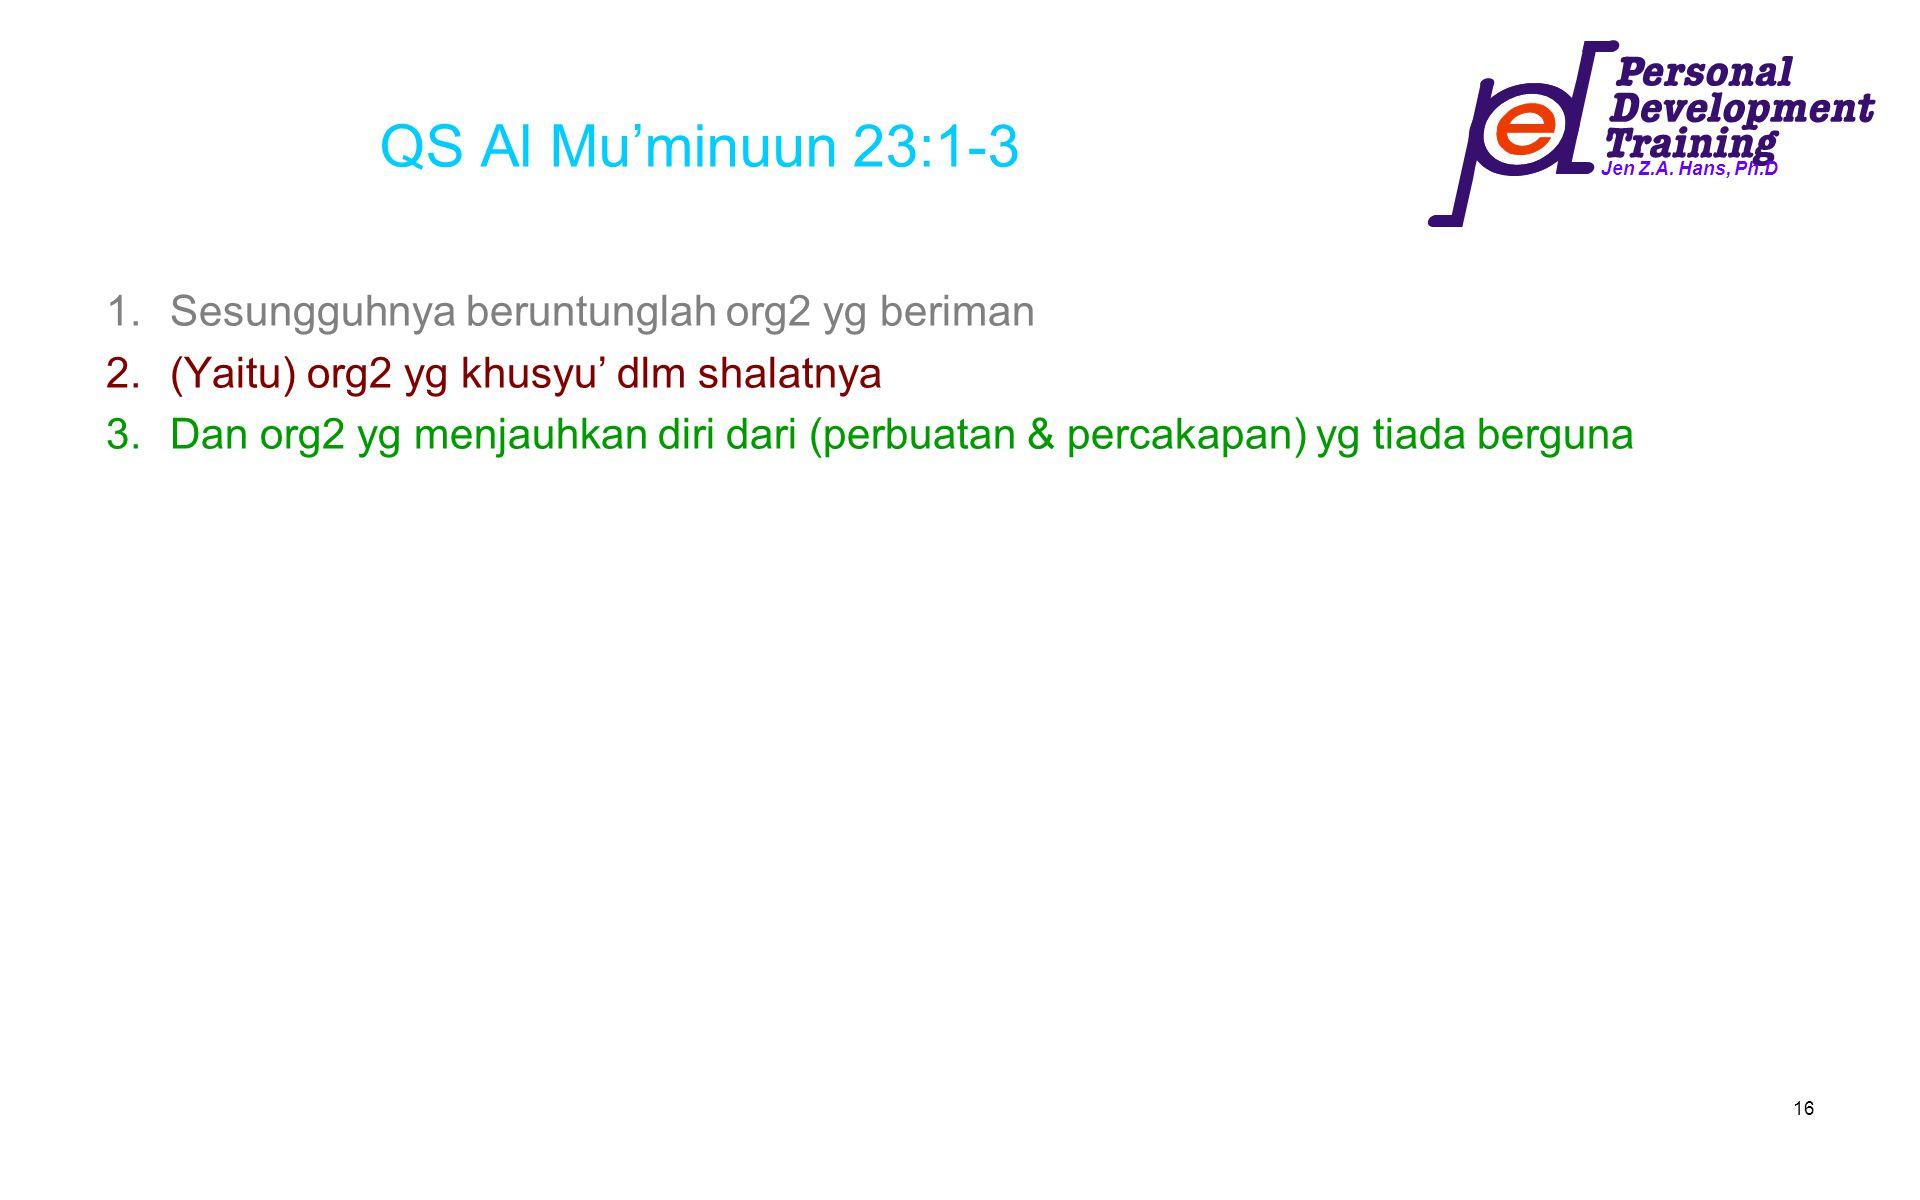 QS Al Mu'minuun 23:1-3 Sesungguhnya beruntunglah org2 yg beriman